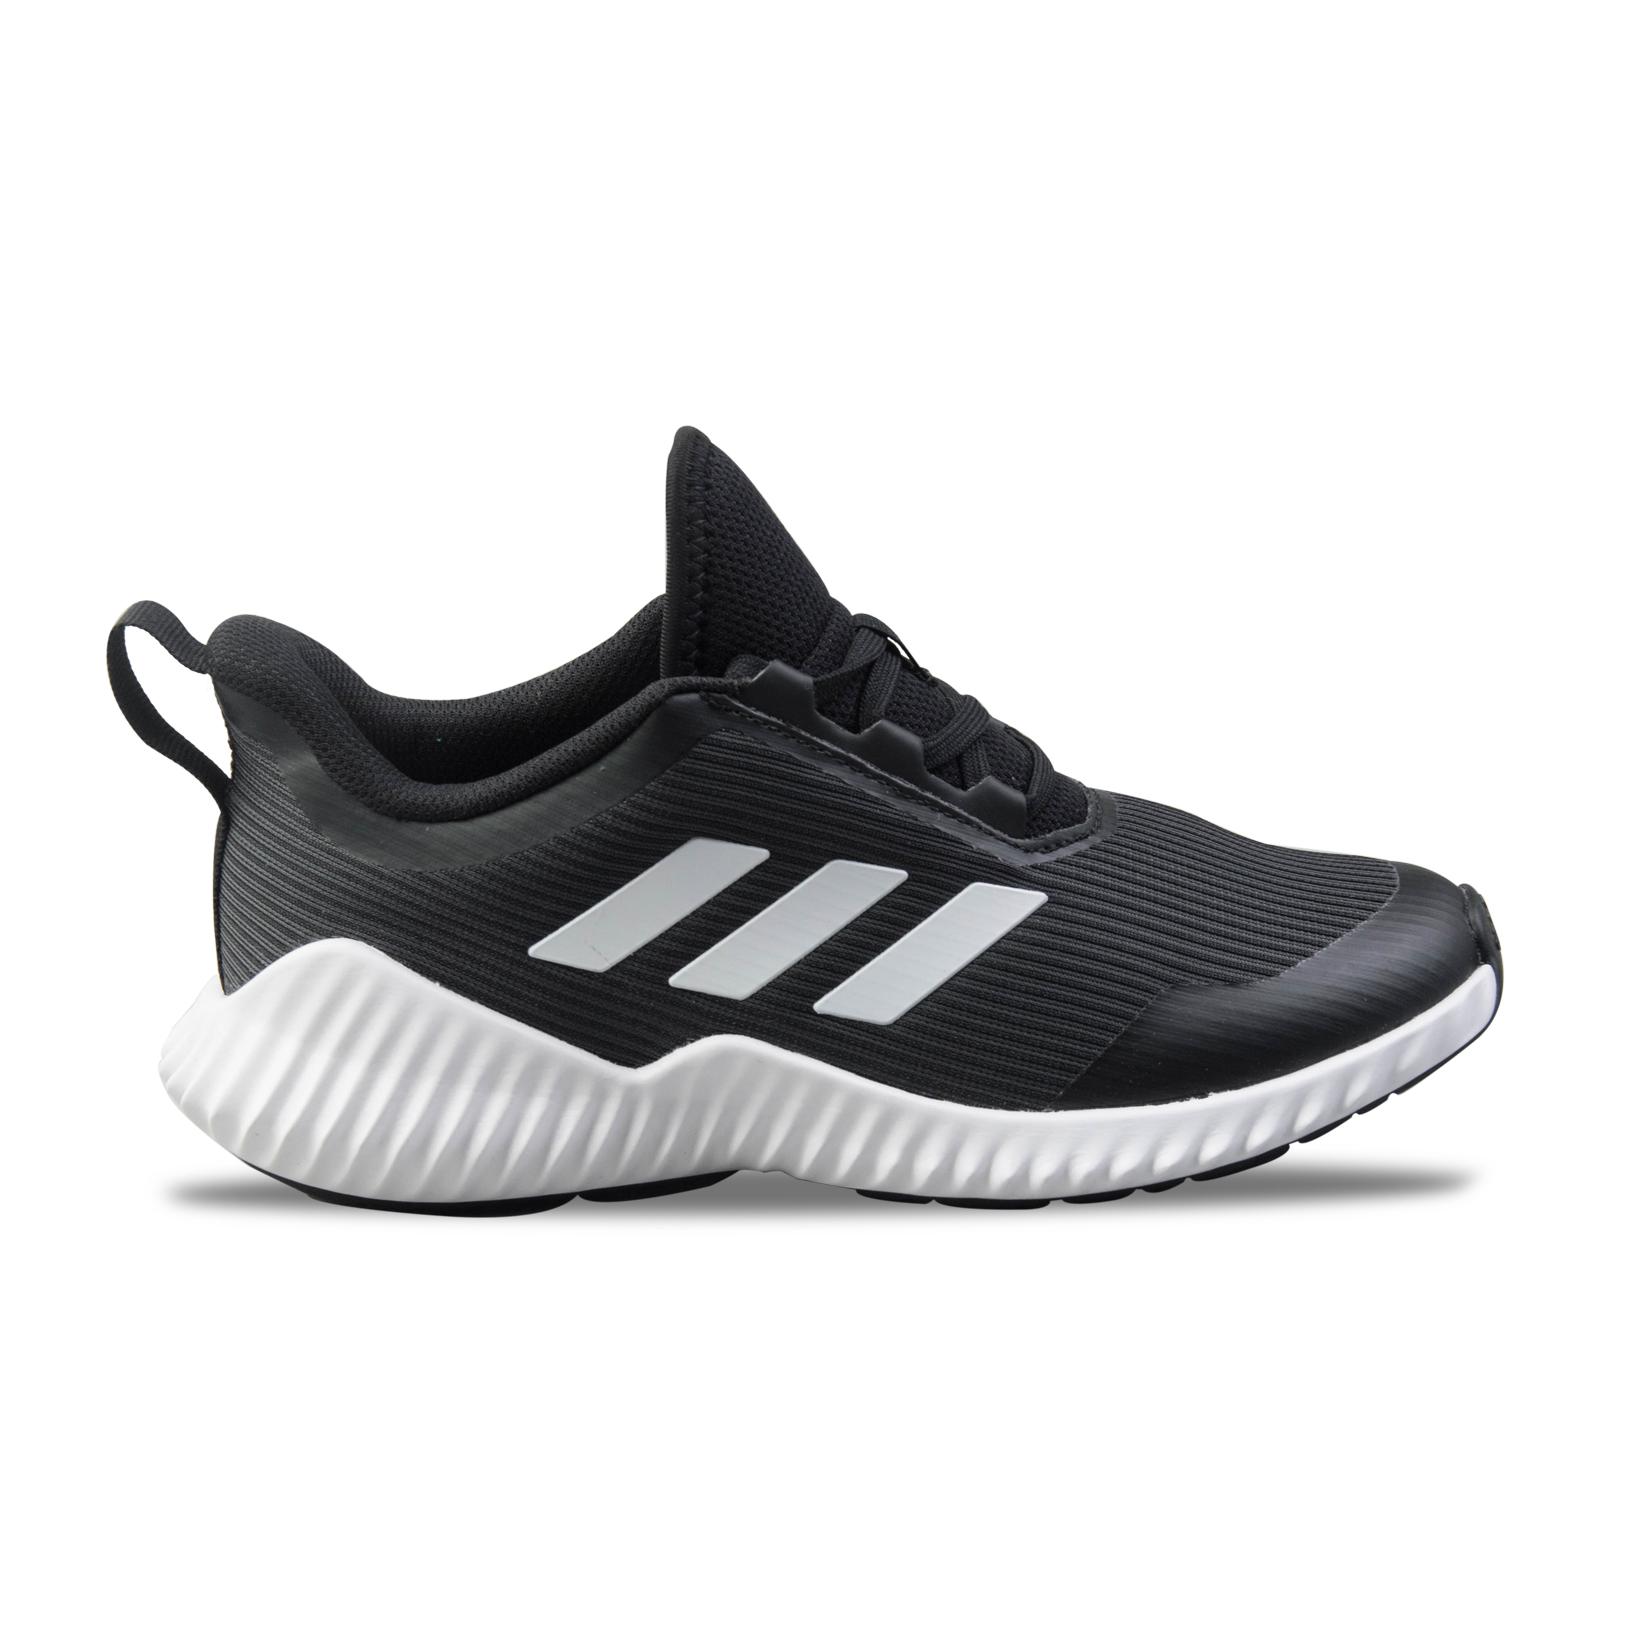 Adidas Fortarun Black